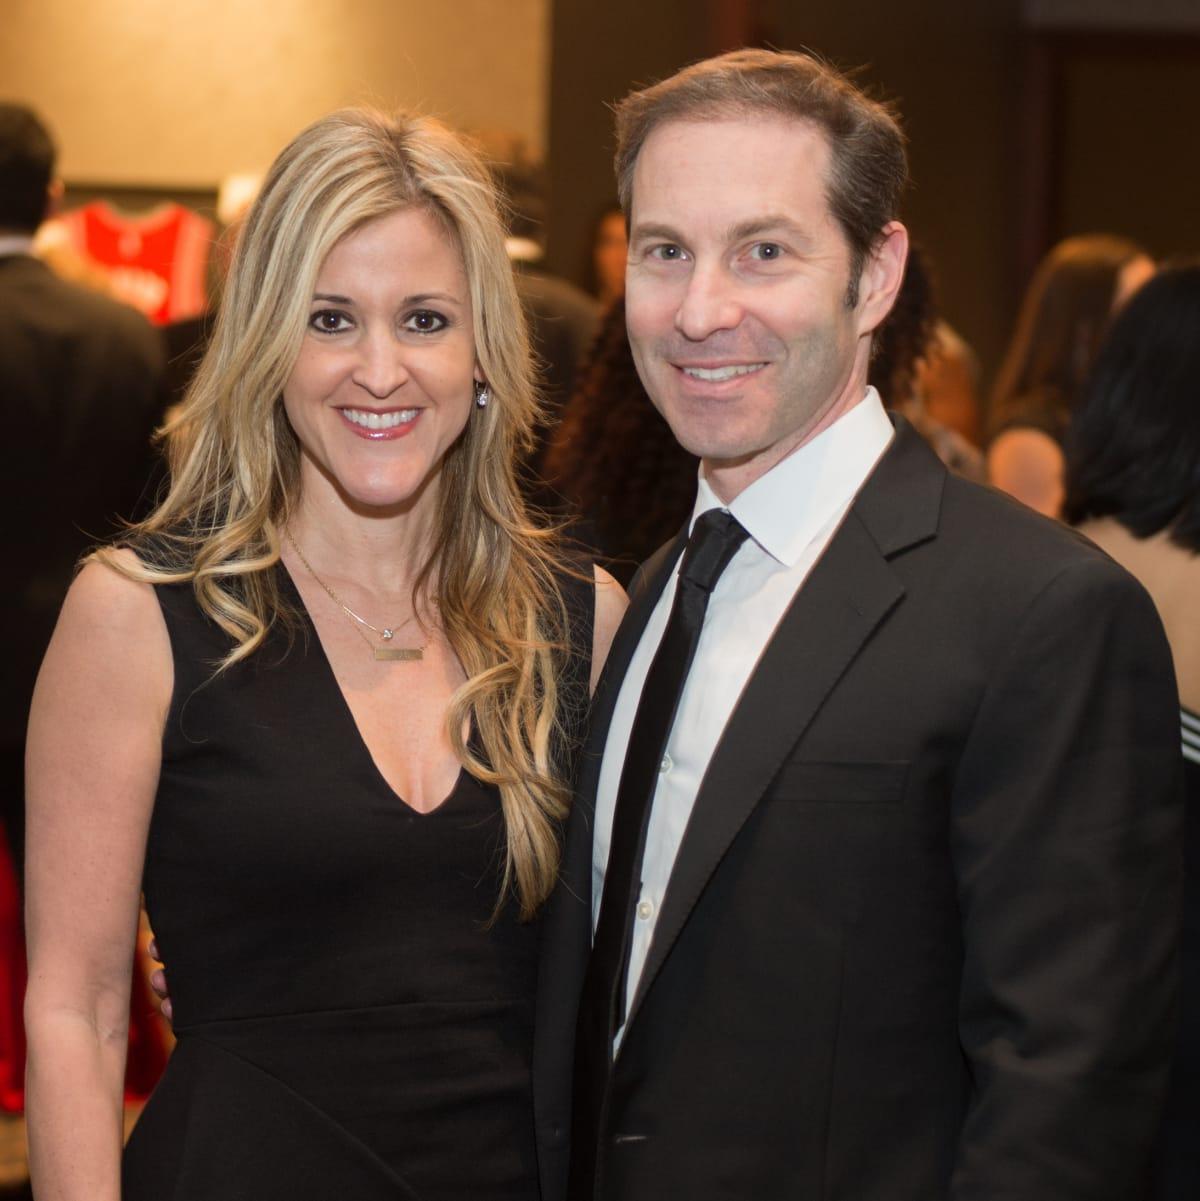 Houston, Pink Door Night of the Phoenix Gala, November 2015, Courtney Zubowski Haas, Dr. Eric Haas.